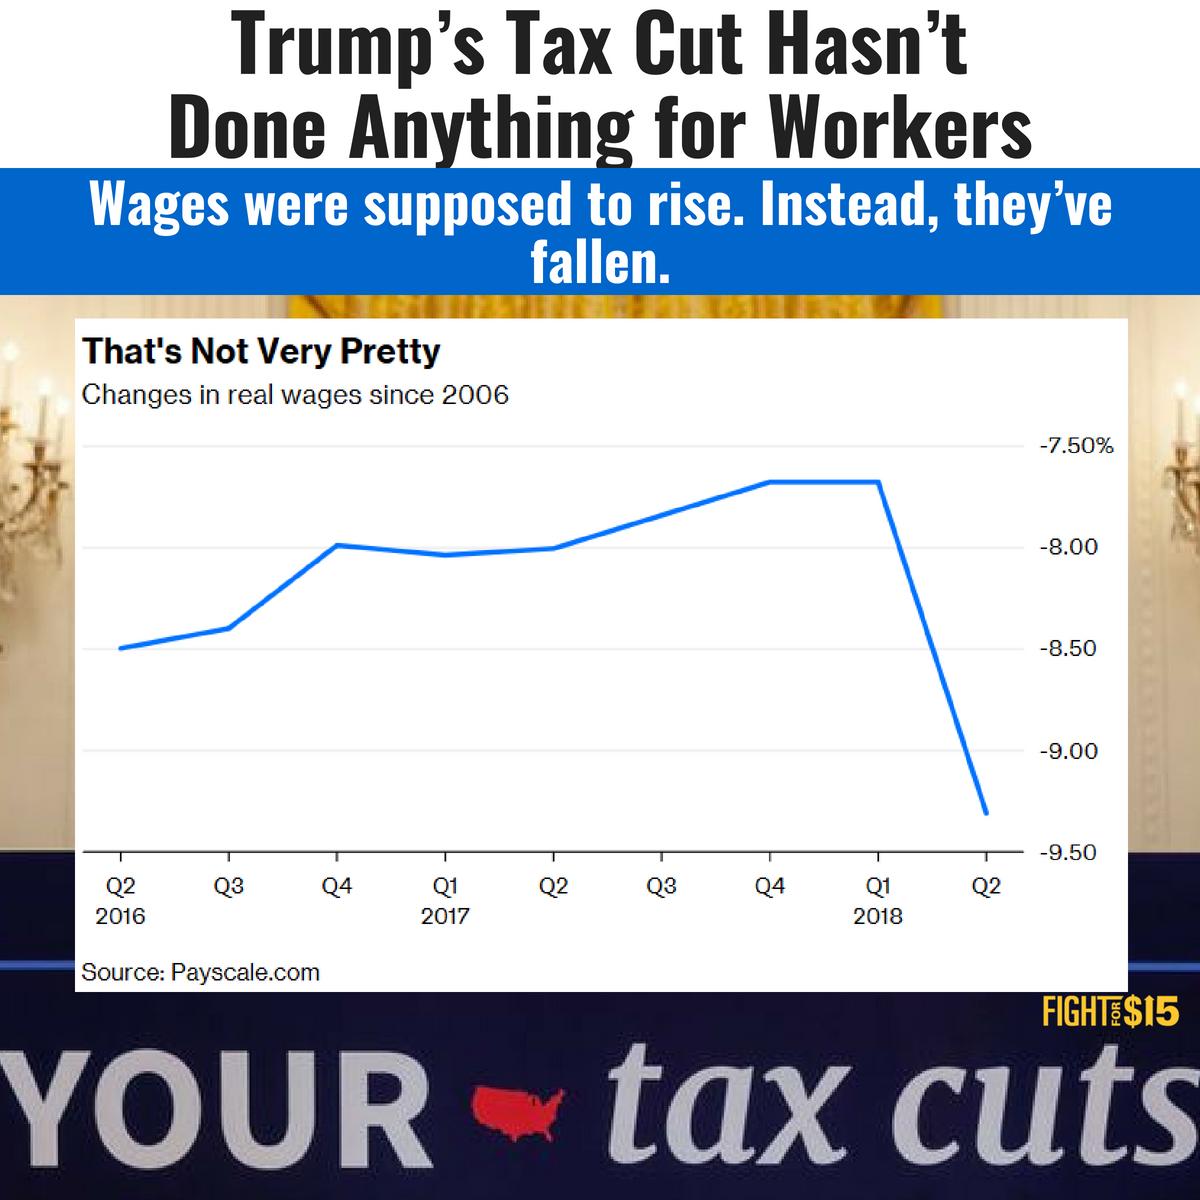 .@realdonaldtrump's tax scam is class warfare in action. https://t.co/QtDK6LZQOW #FightFor15 #TrumpTaxScam